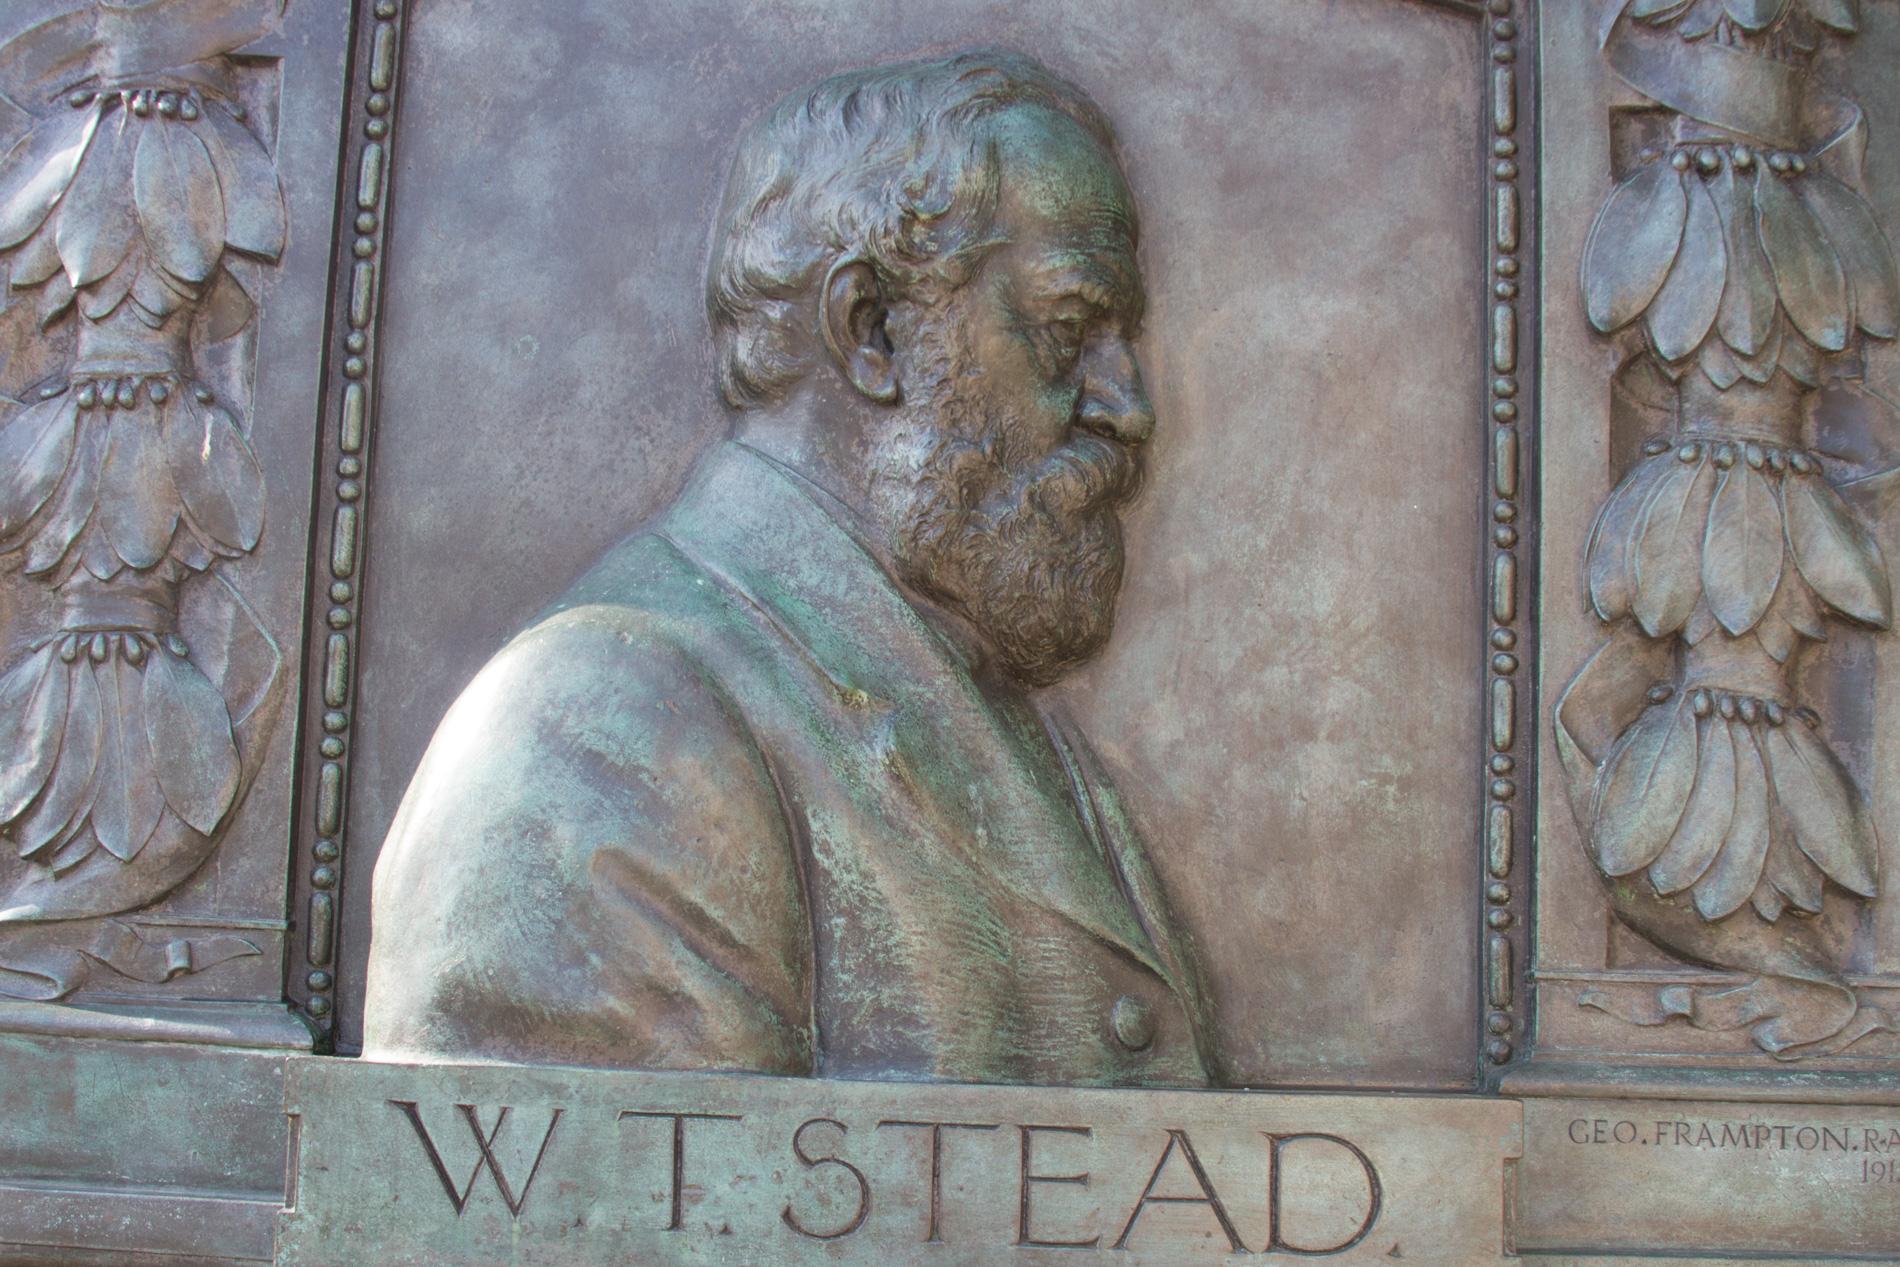 W. T. Stead Memorial [5802]